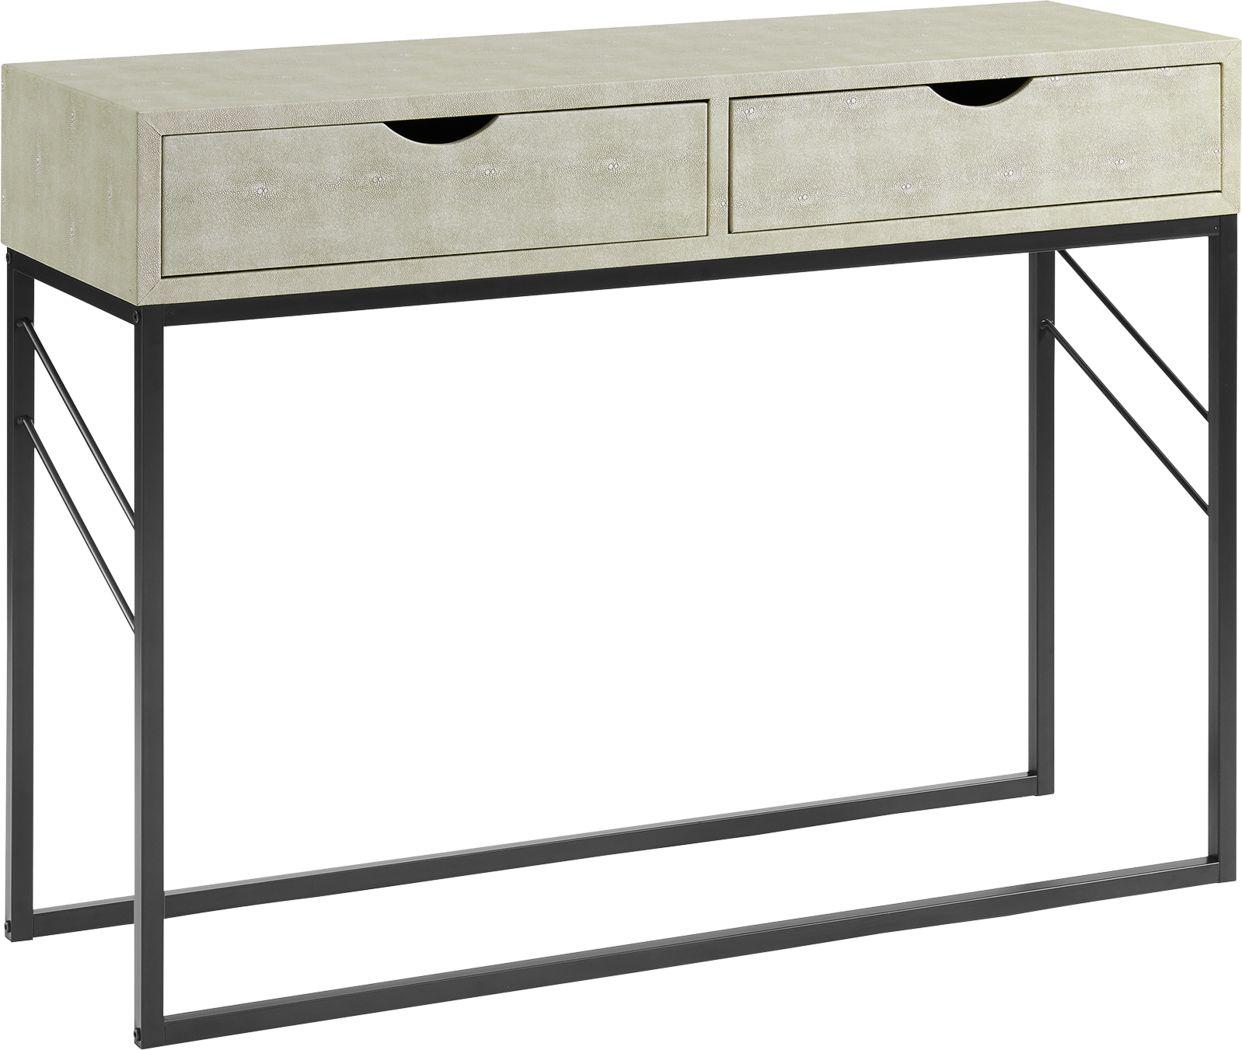 Marwill White Sofa Table